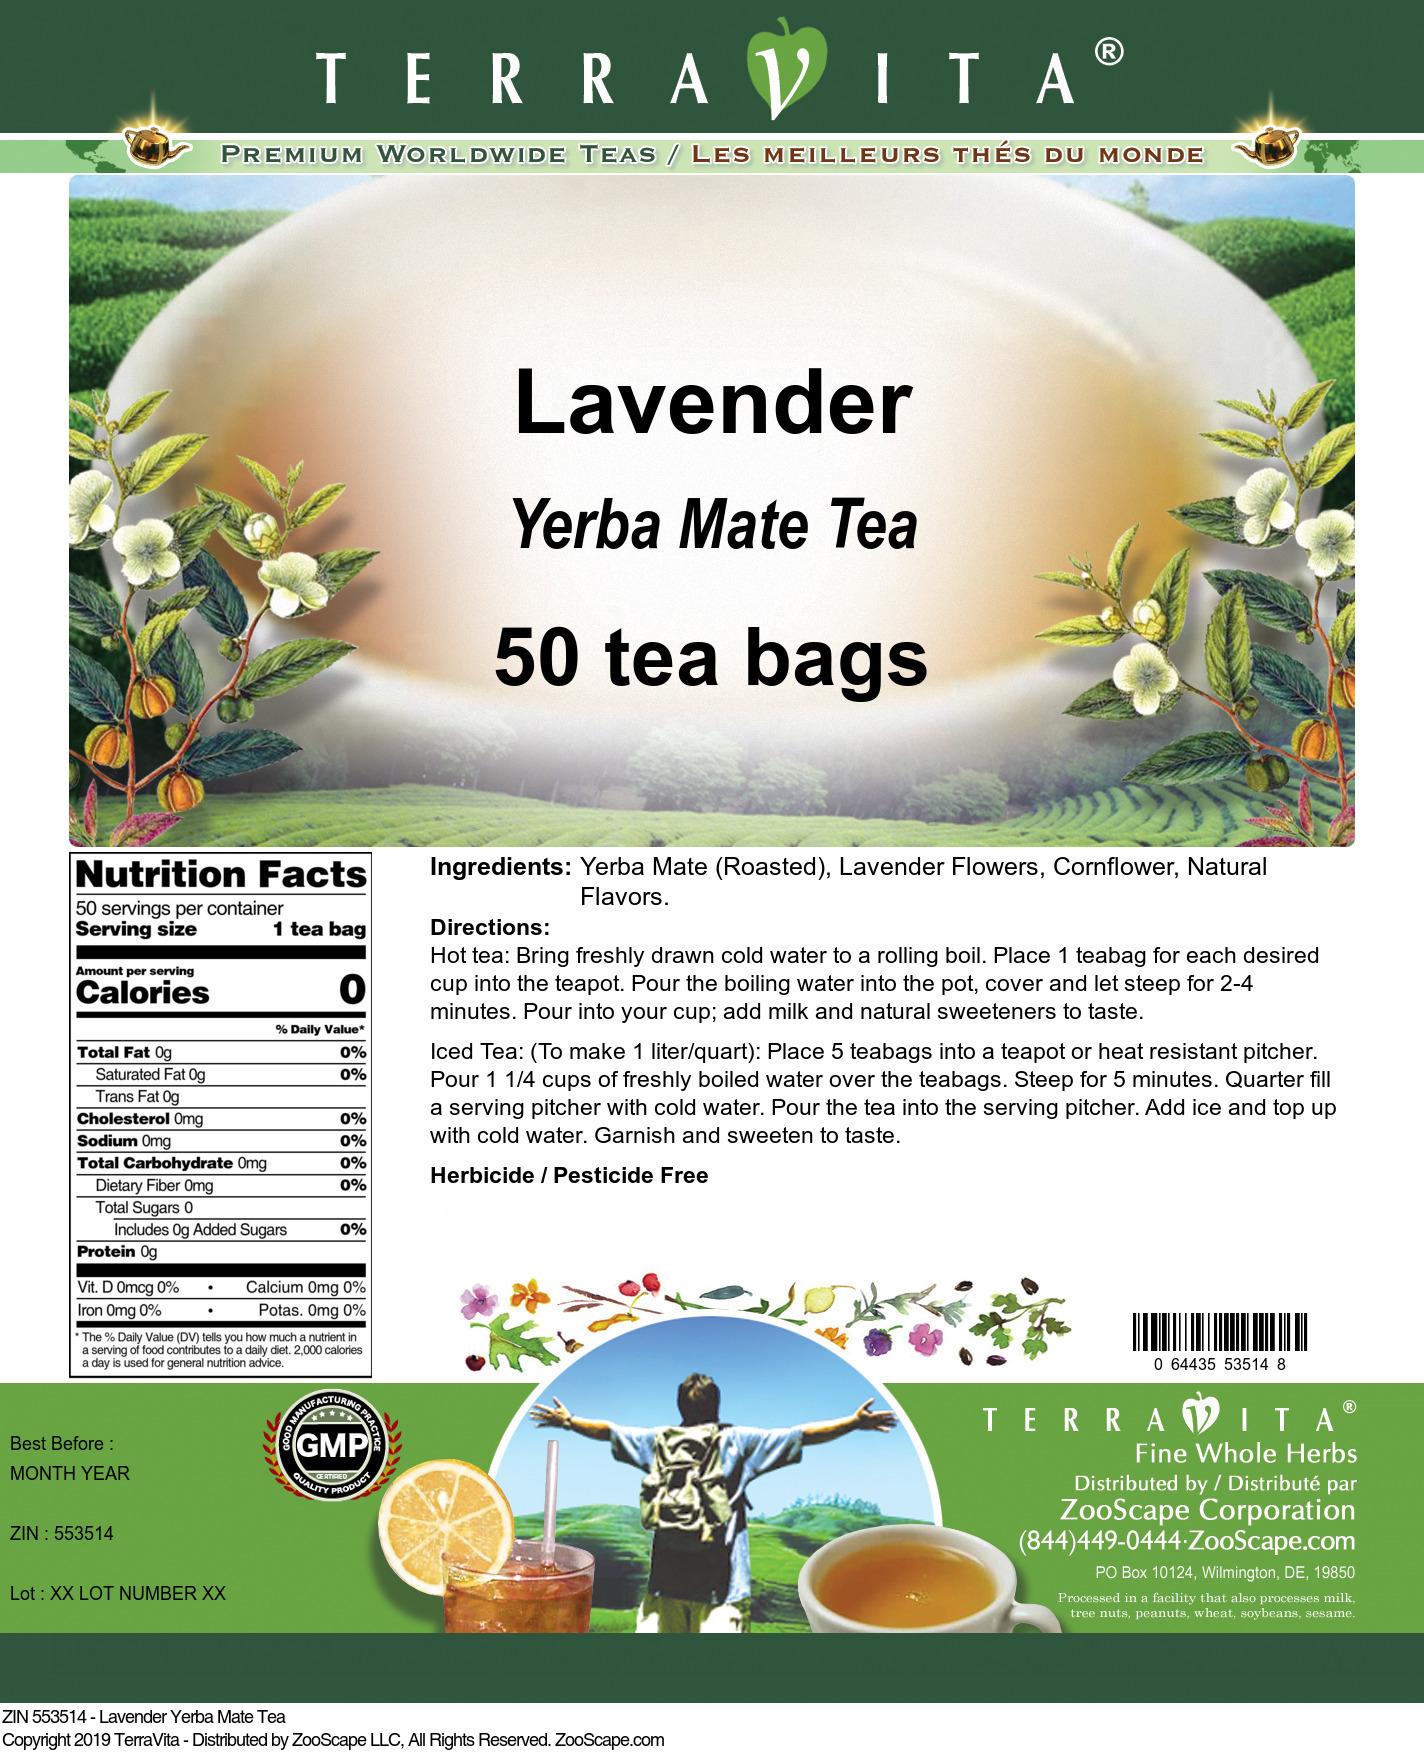 Lavender Yerba Mate